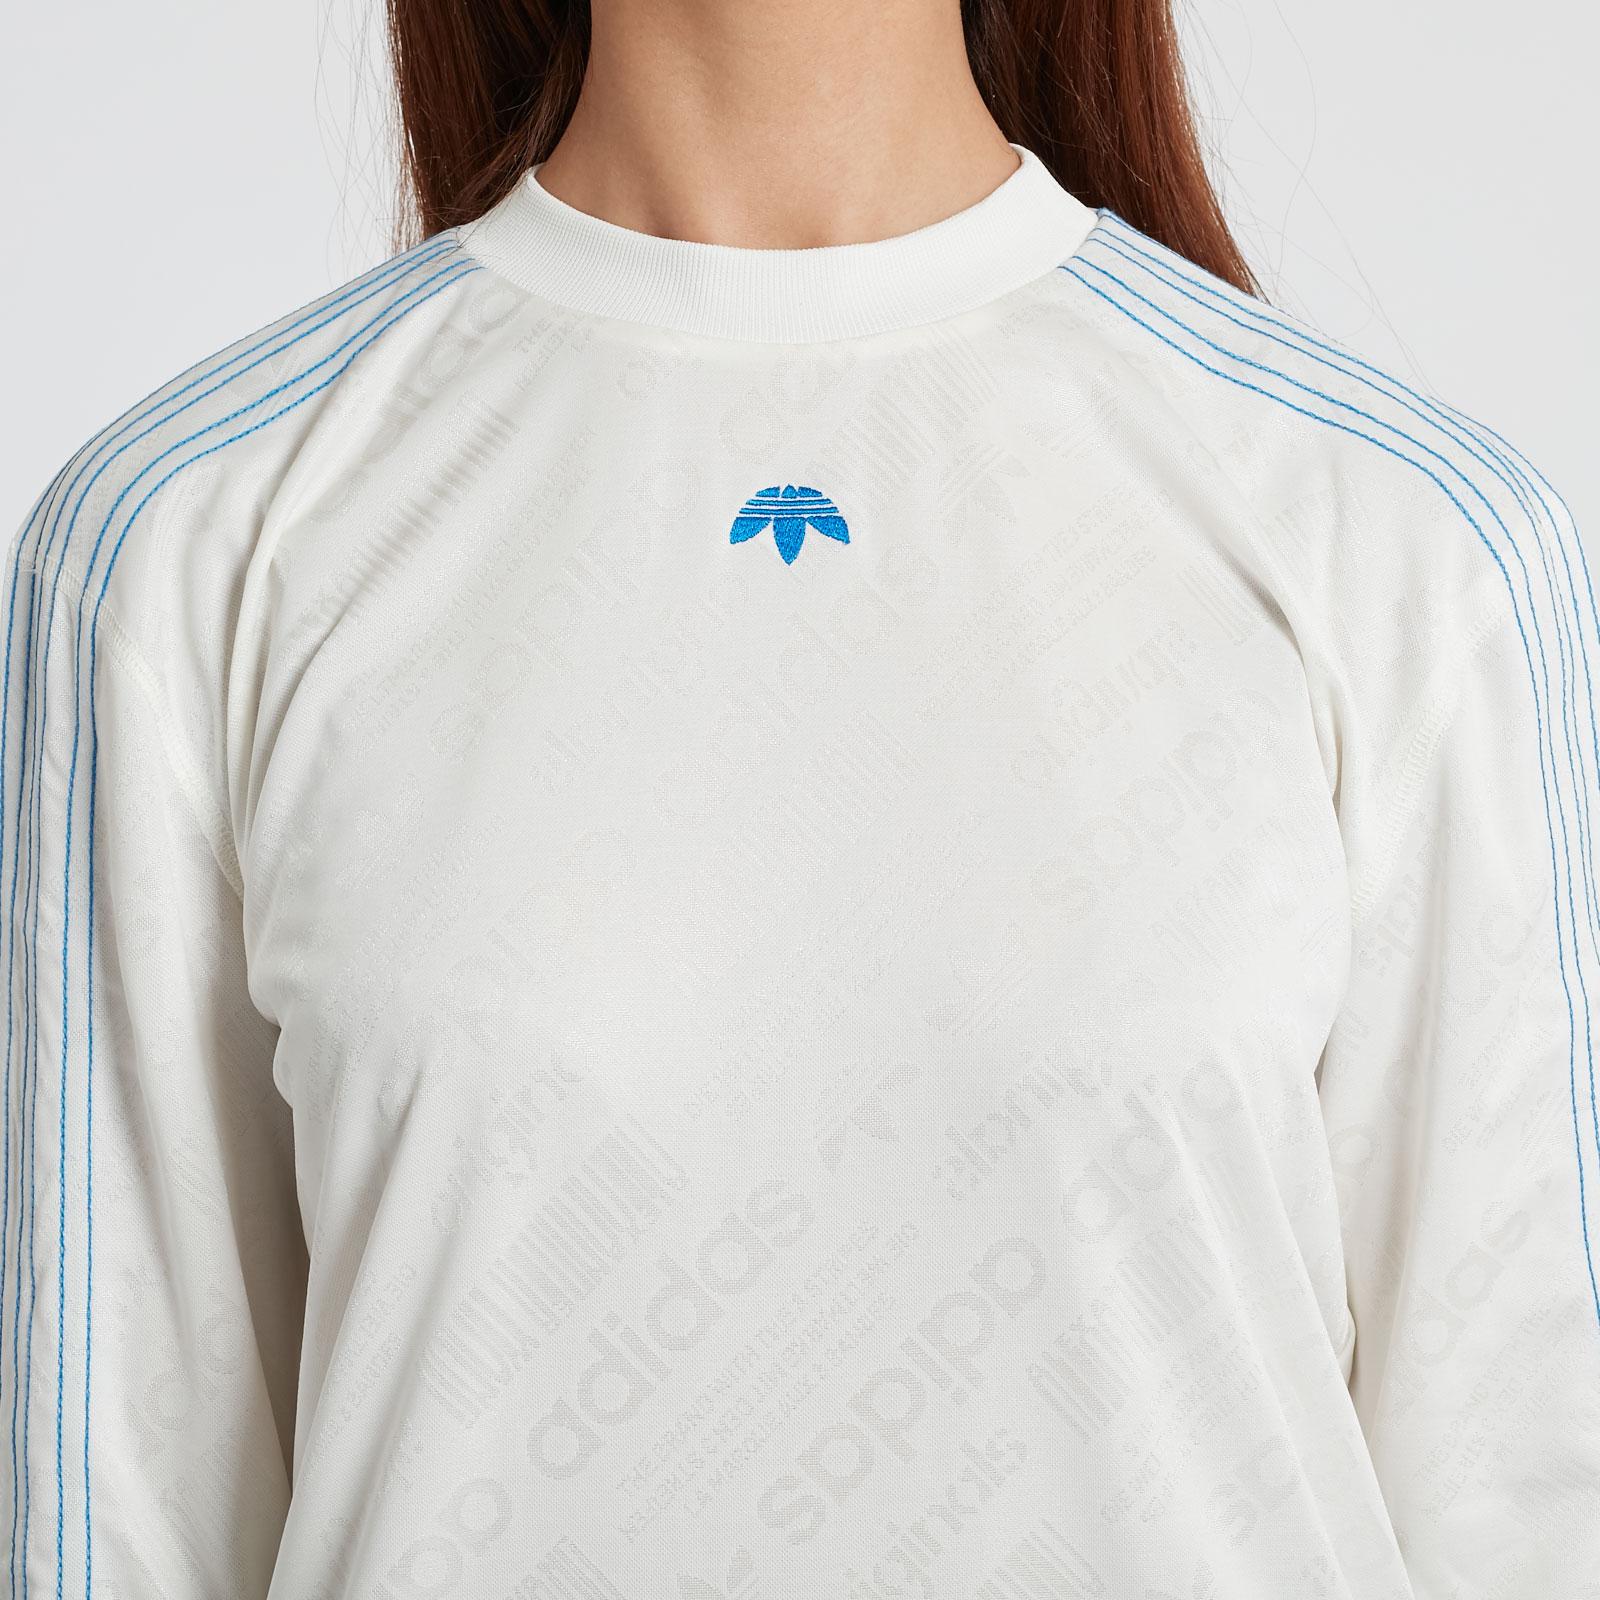 0c4298aa9406 ... adidas Originals by Alexander Wang Soccer Long Sleeve ...